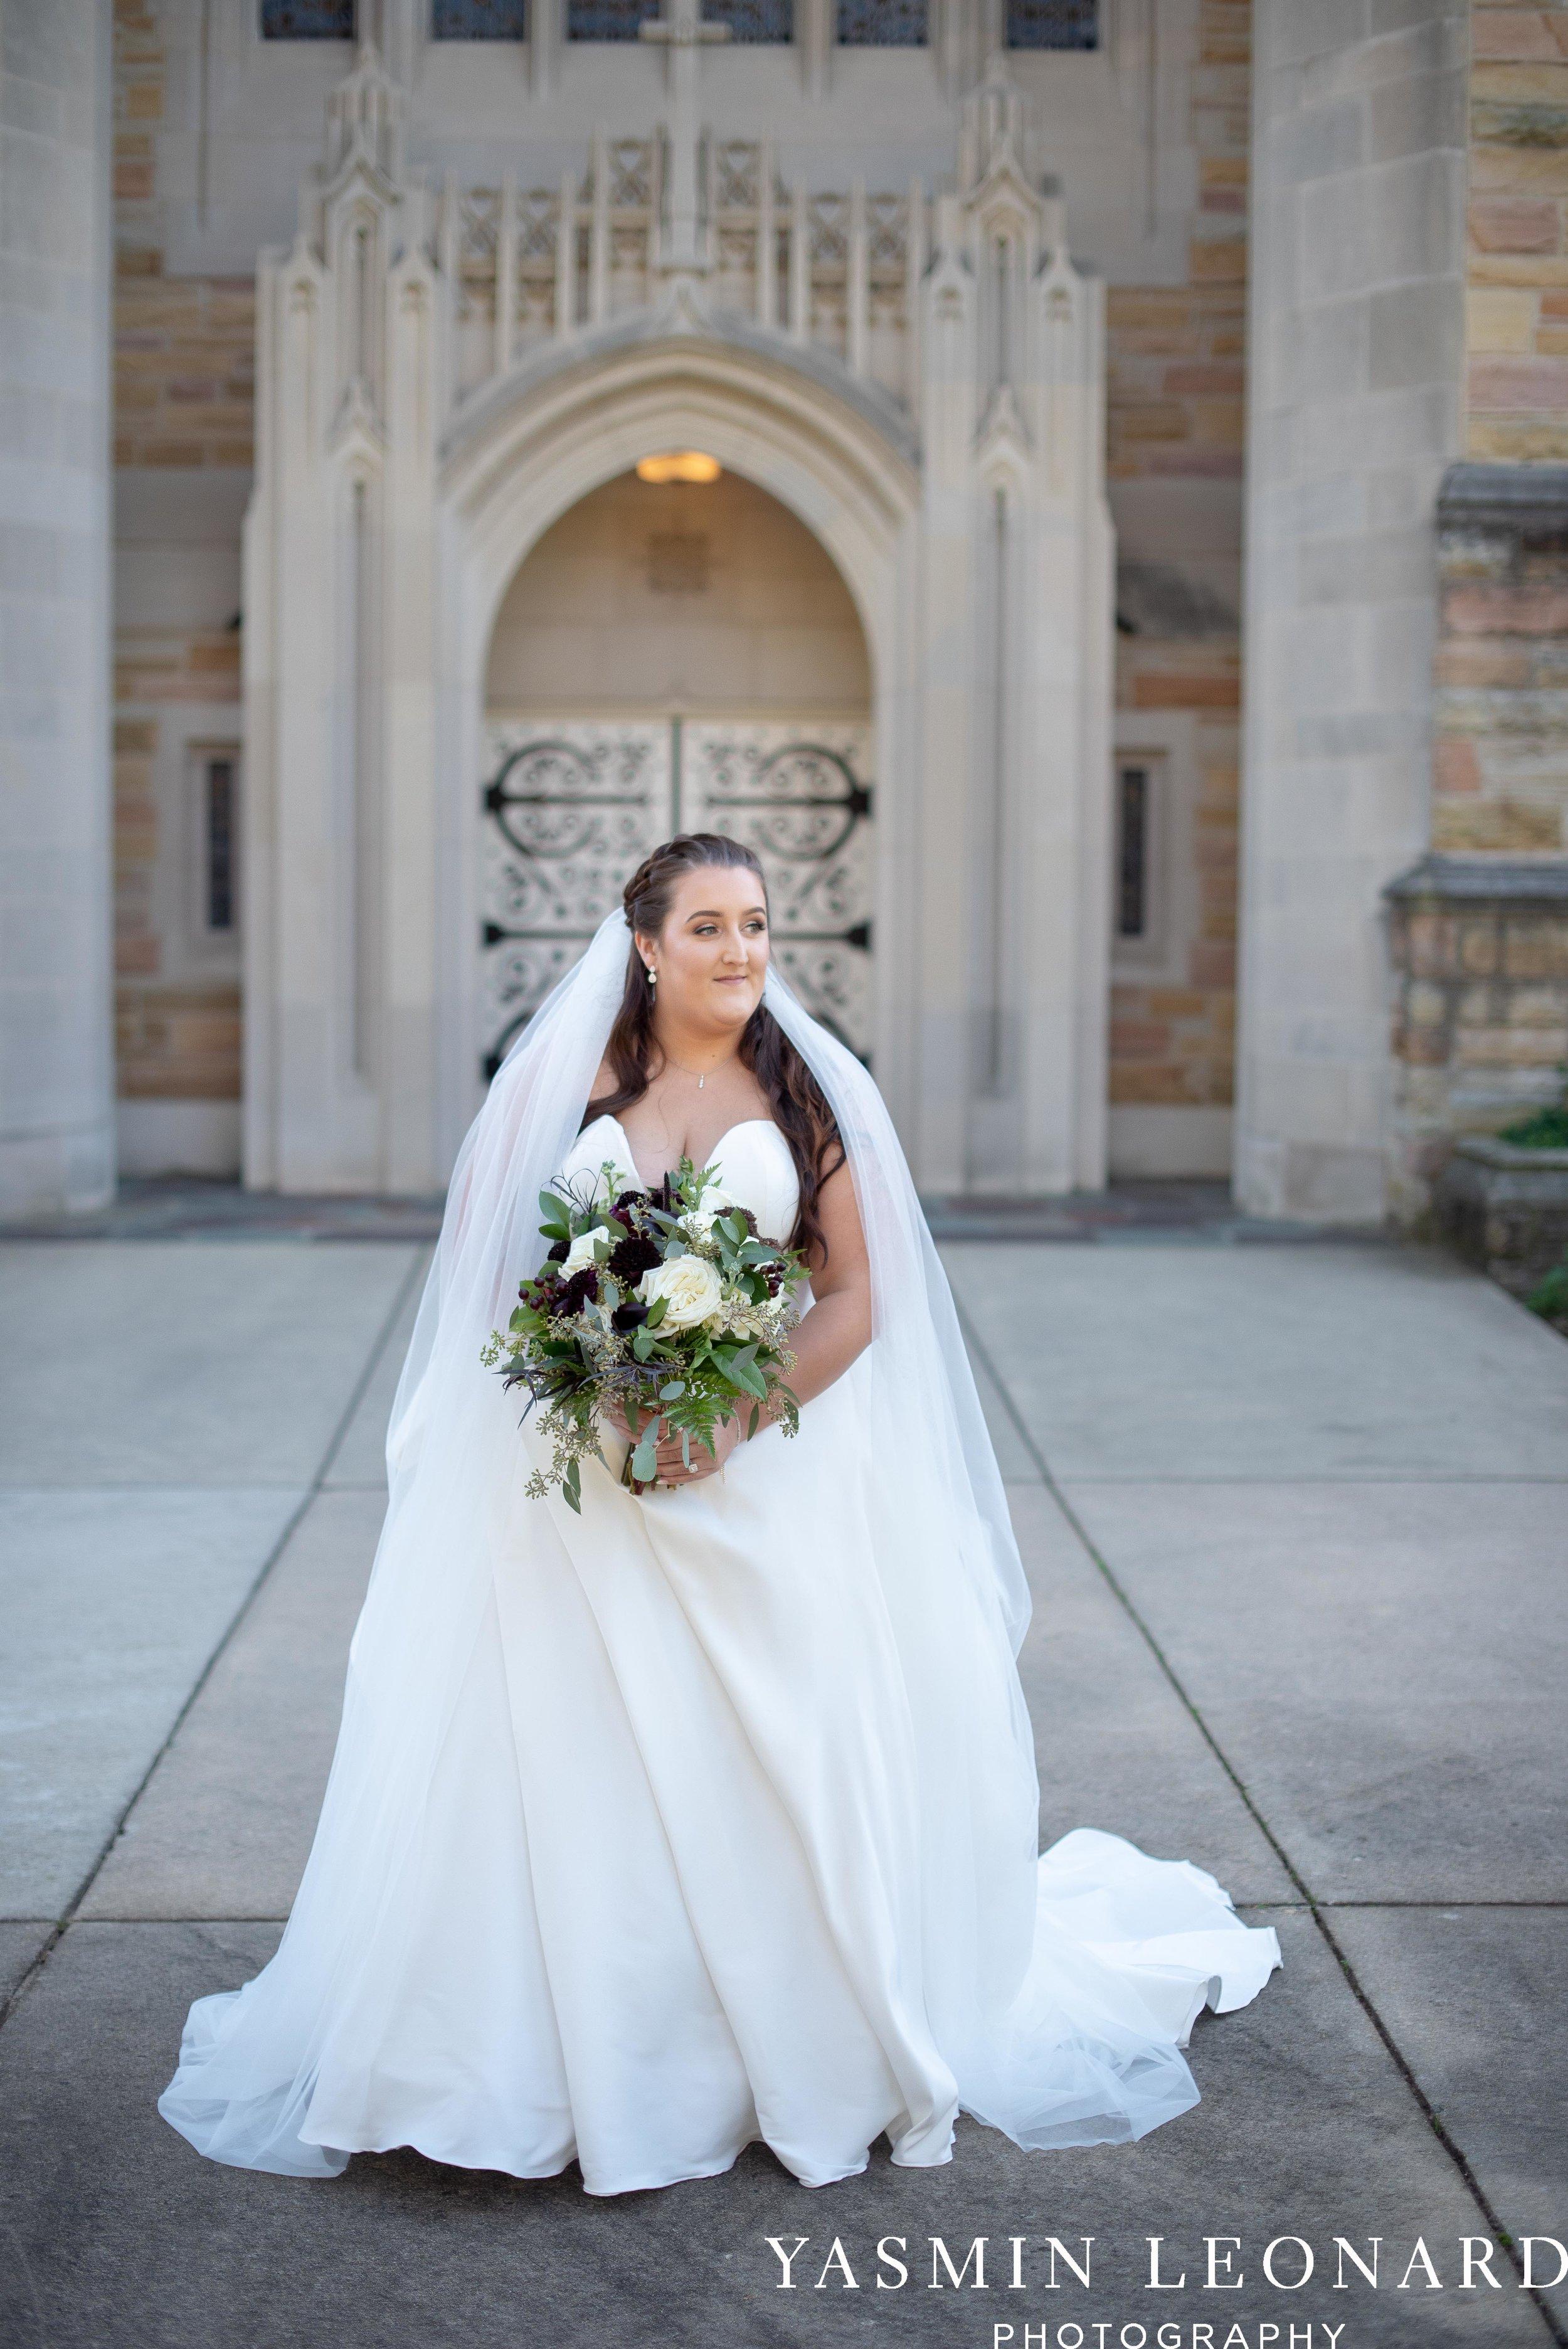 Wesley Memorial United Methodist Church - Old Homeplace Winery - High Point Weddings - High Point Wedding Photographer - NC Weddings - NC Barn Venue - Yasmin Leonard Photography-4.jpg